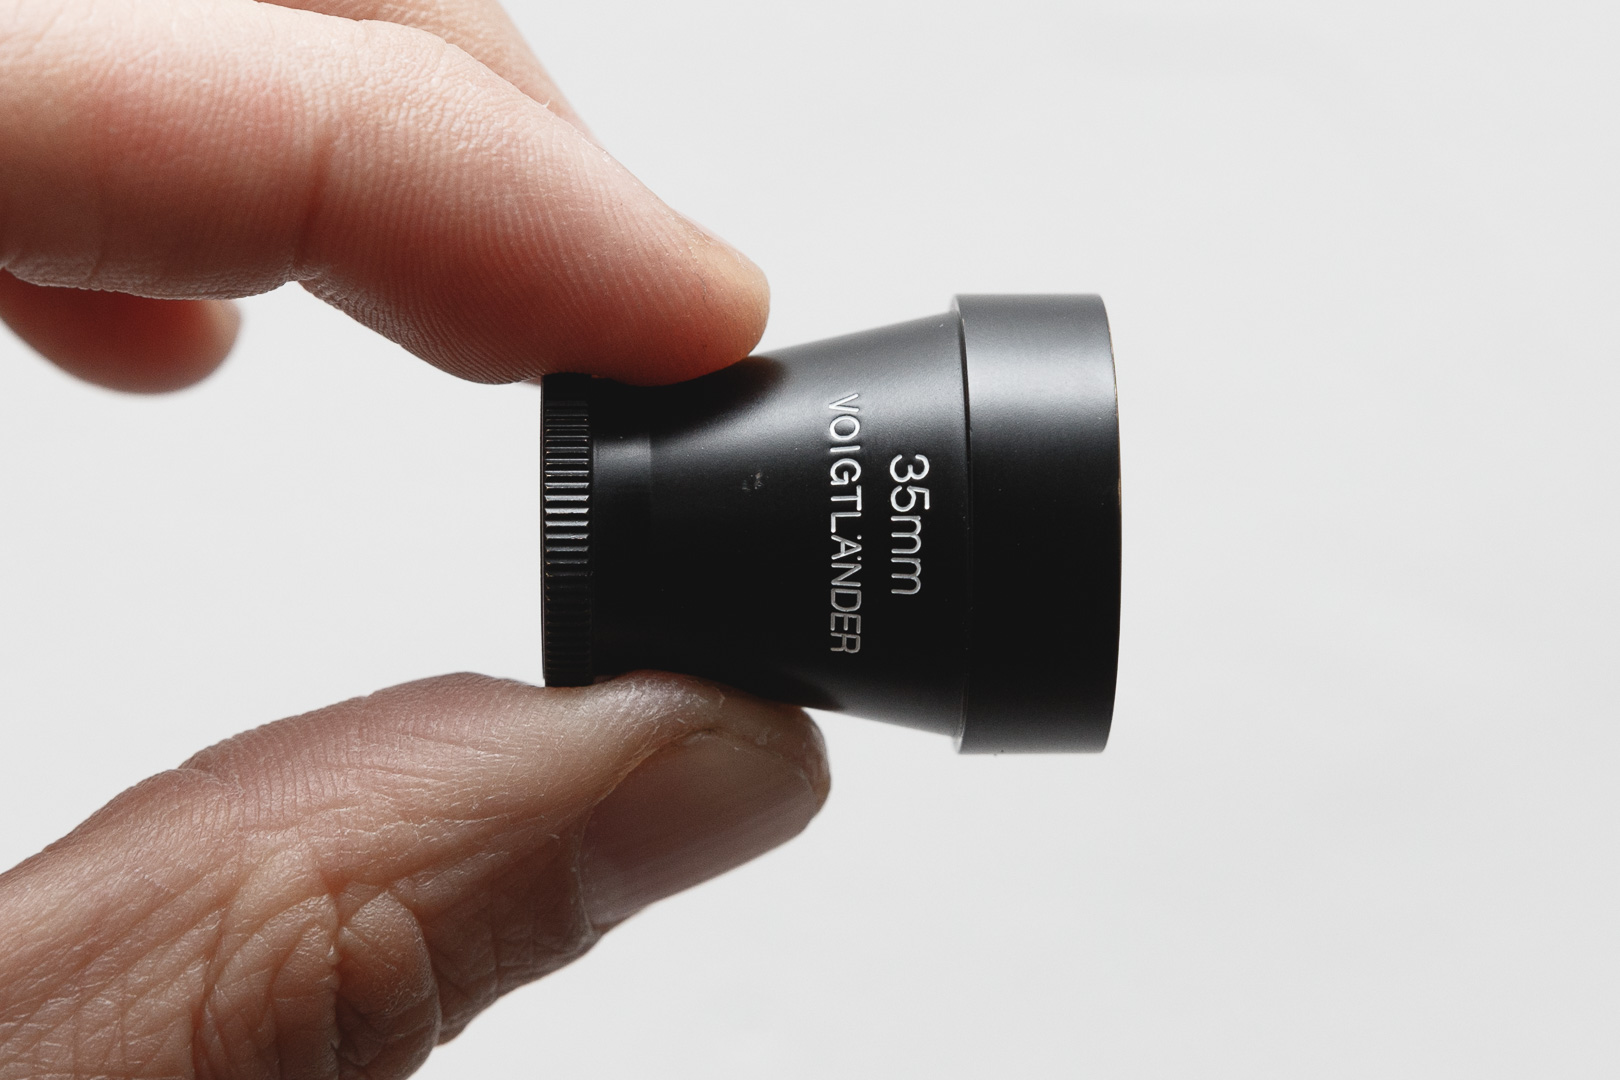 Voigtlander-35mm-Brightline-Finder-Ant Tran-20170402-3030.jpg